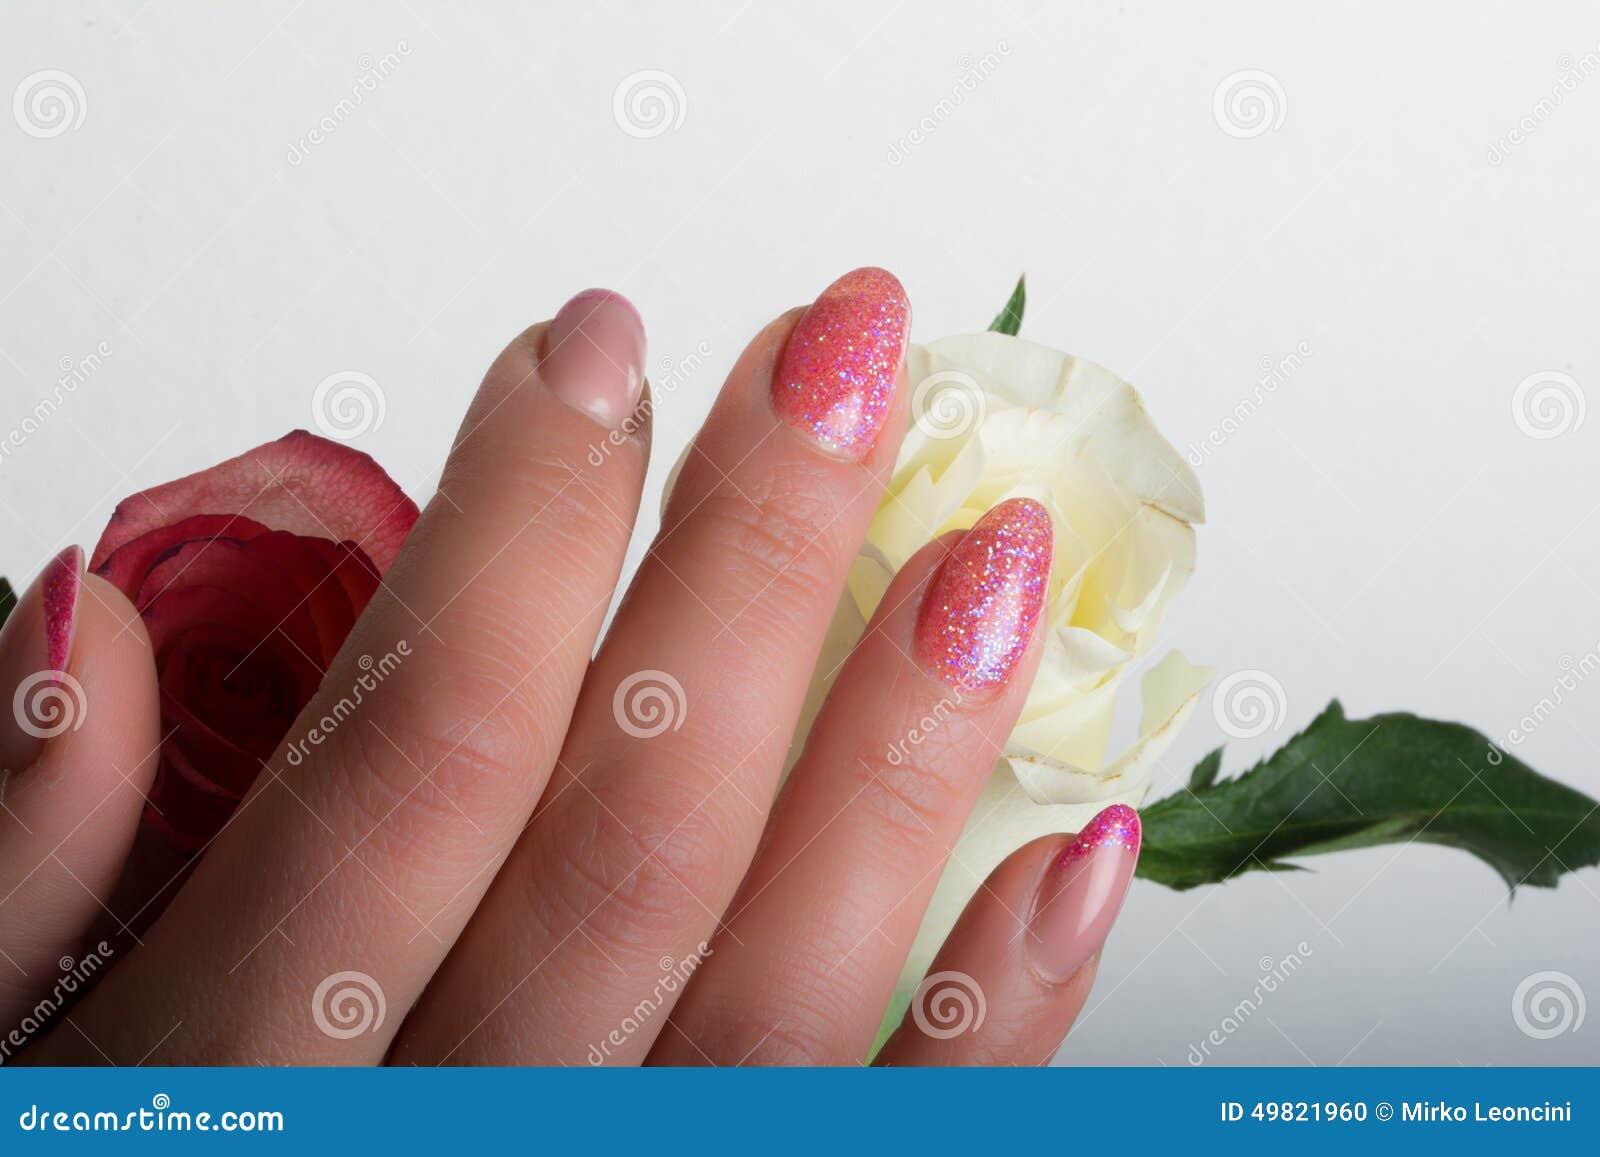 Manicure and nail art stock photo. Image of nail, beauty - 49821960